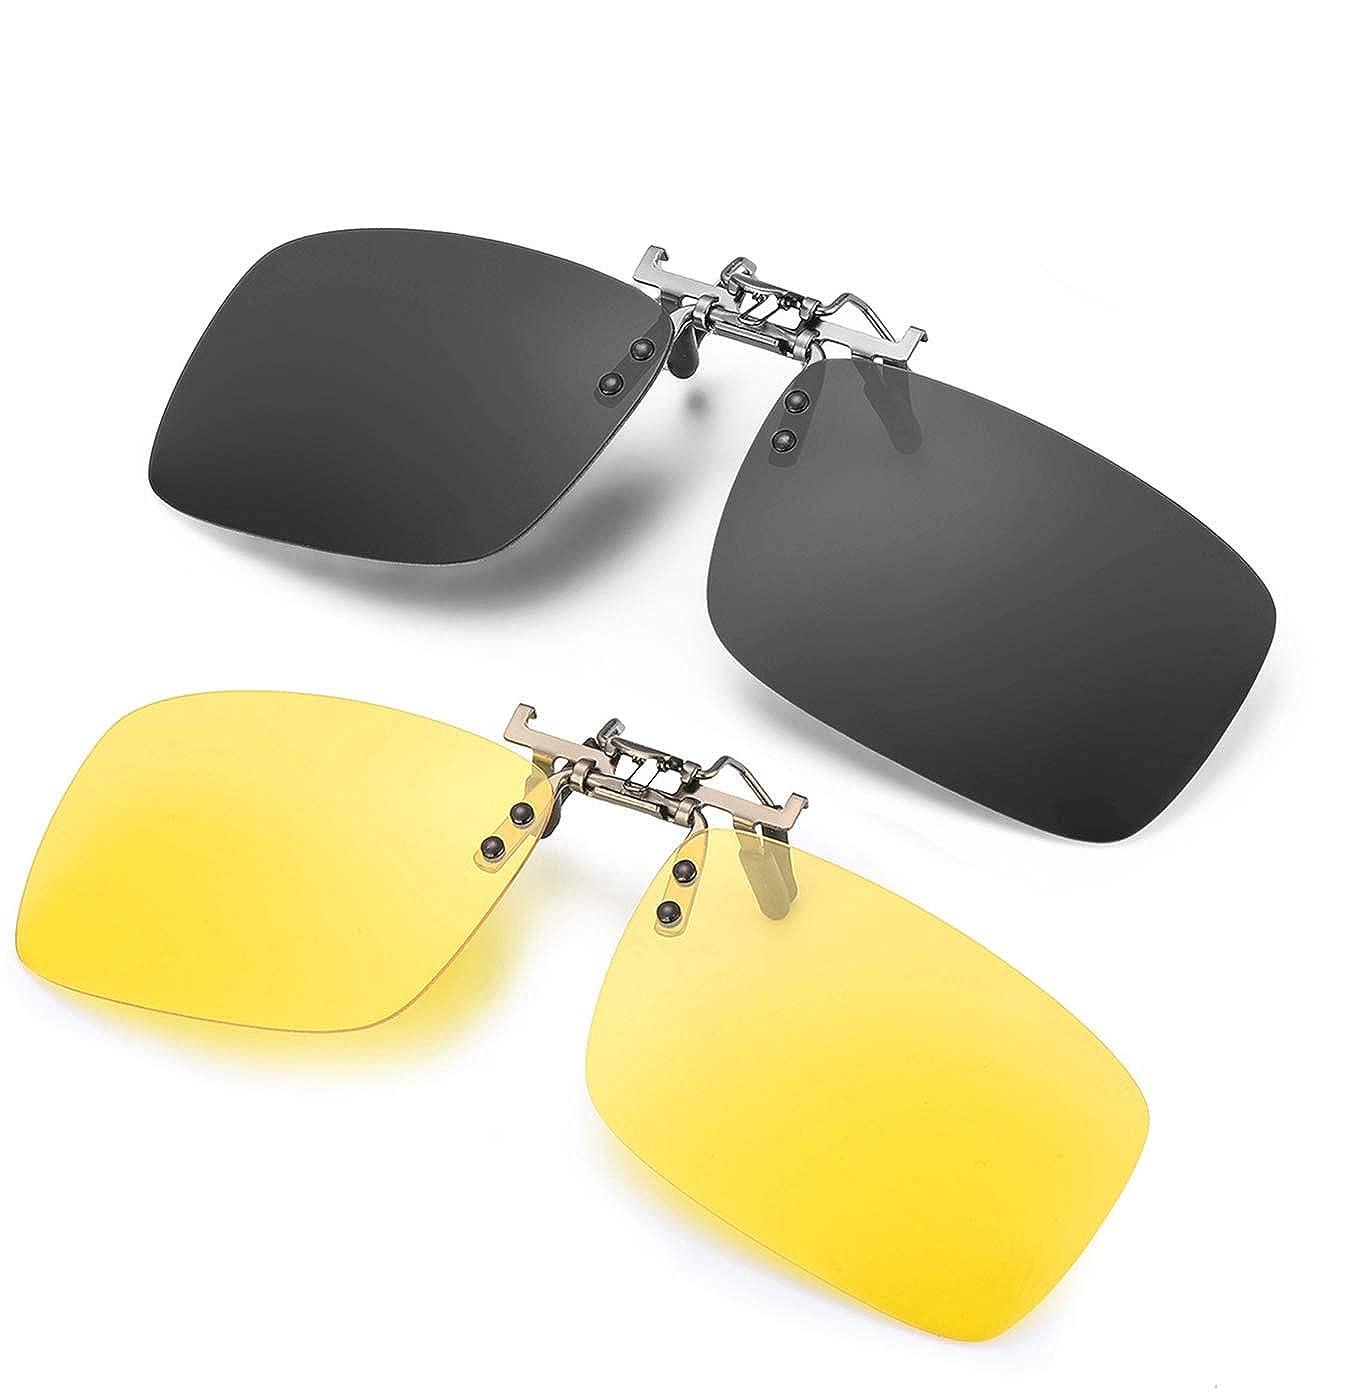 Day+Night Unisex Polarized Clip on Sunglasses for Prescription Glasses 2 PACK Flip Up Rimless Anti Glare Night Vision Lens for Driving Fishing 100/% UVA//UVB Protection